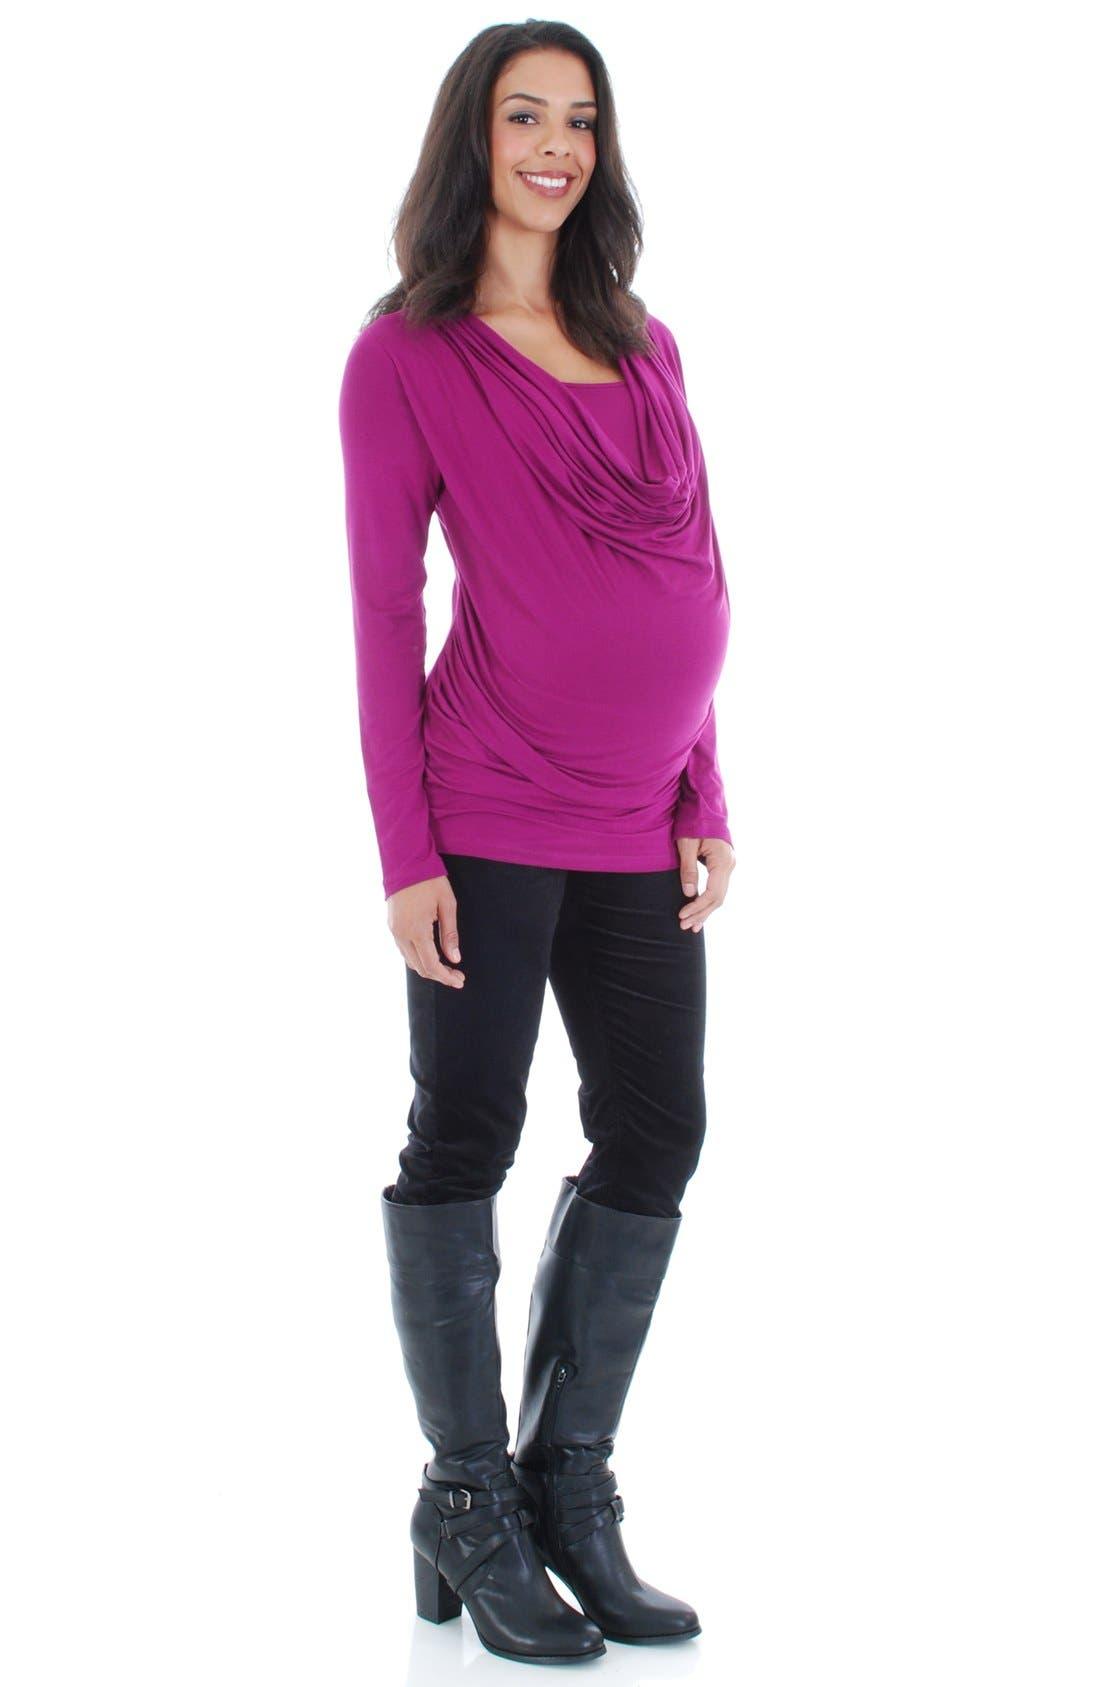 Main Image - EverlyGrey 'Kristina' Cowl Neck Maternity/Nursing Top